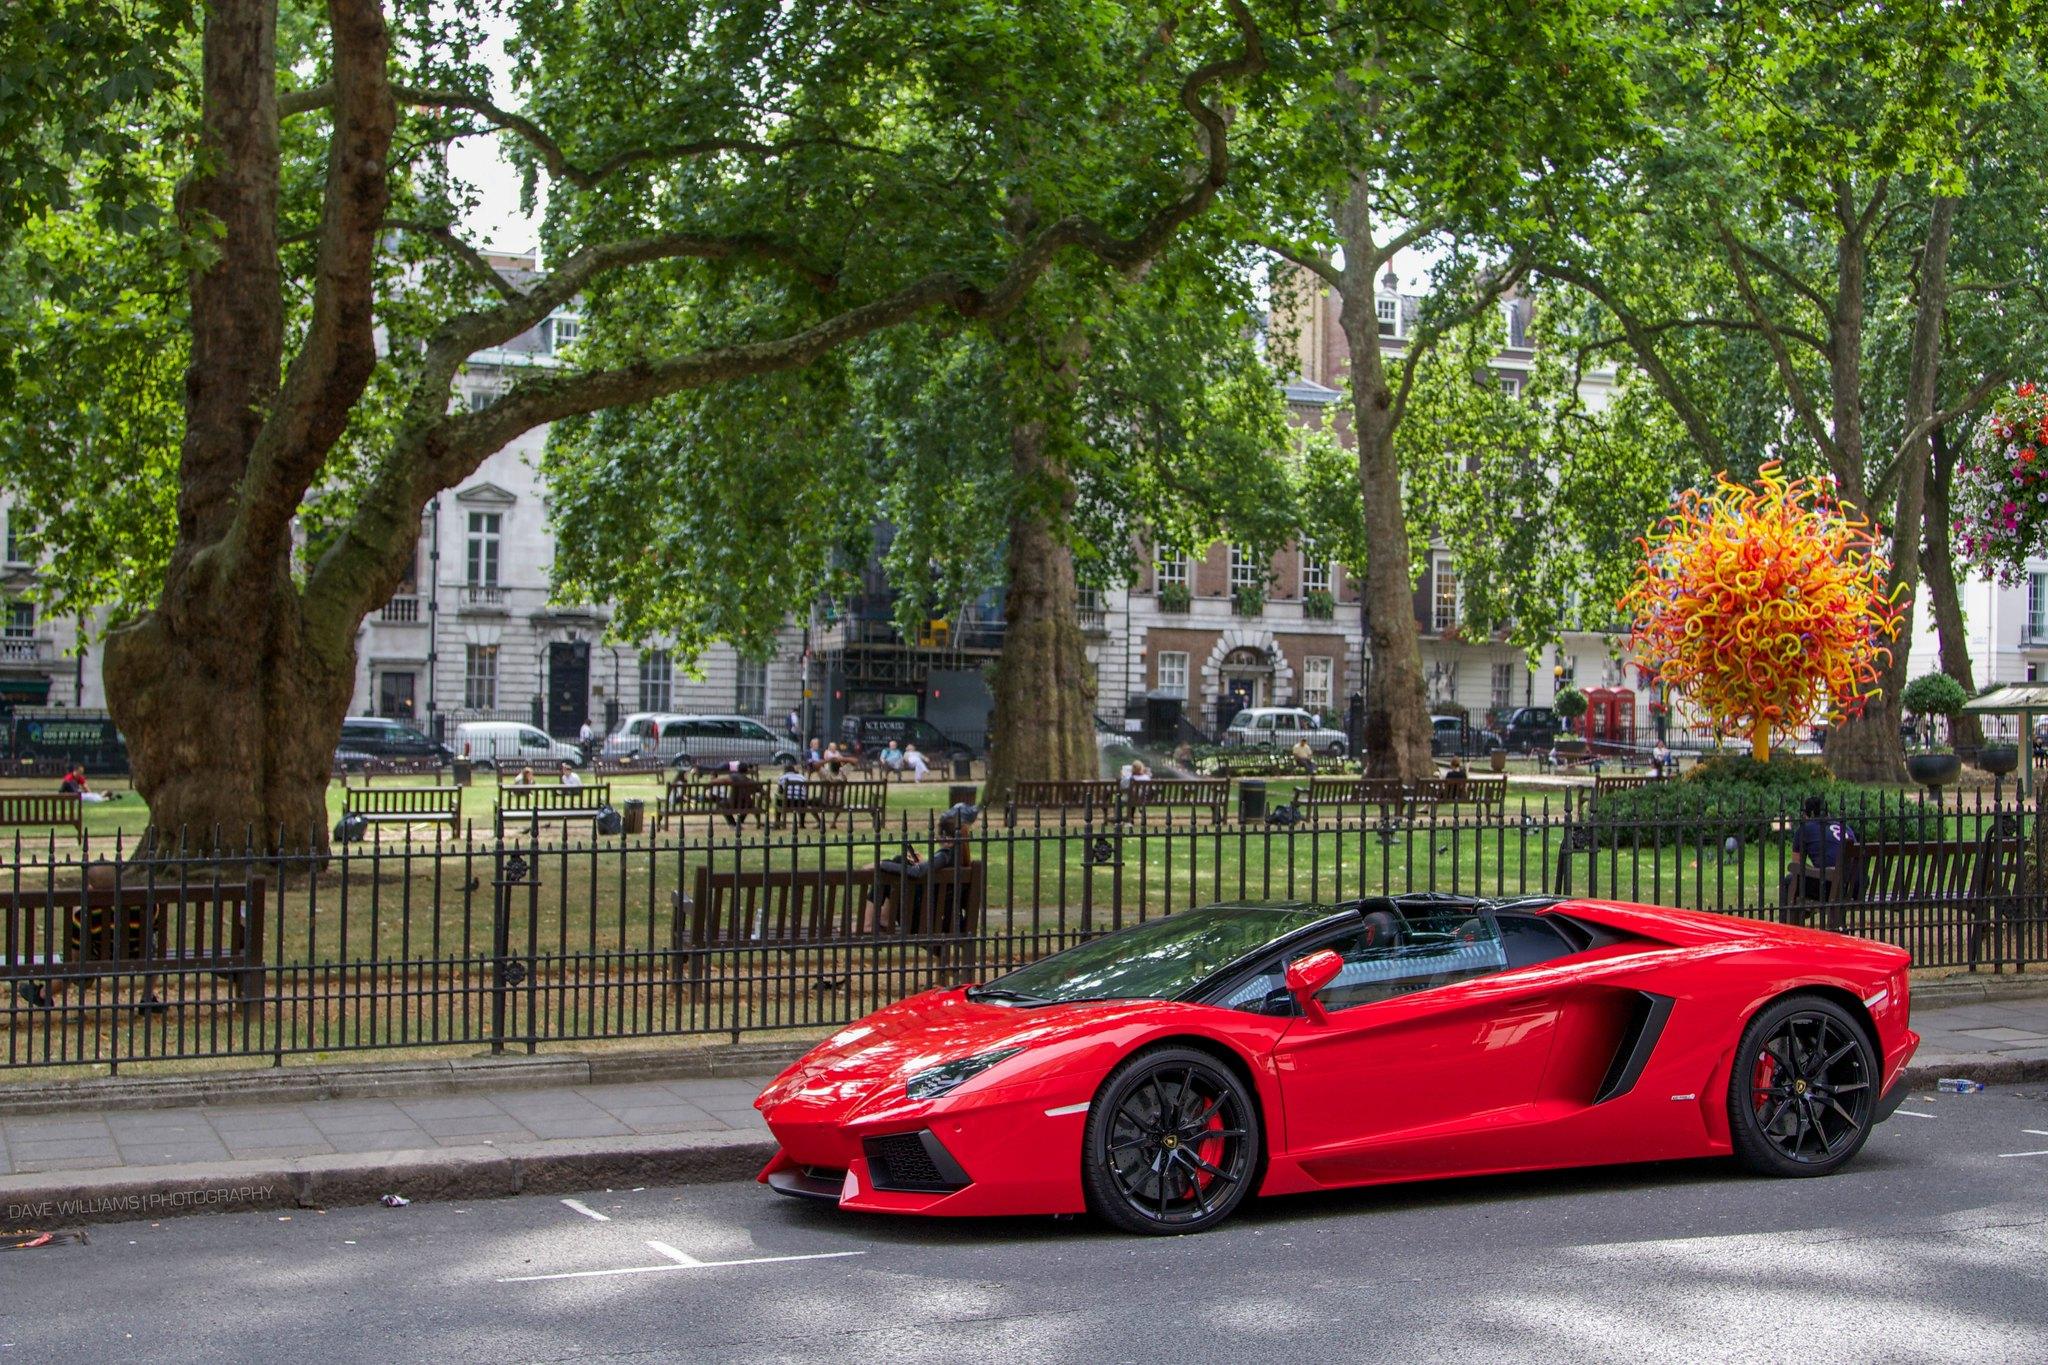 Lamborghini Aventador In Red Os 2048 X 1365 Carporn